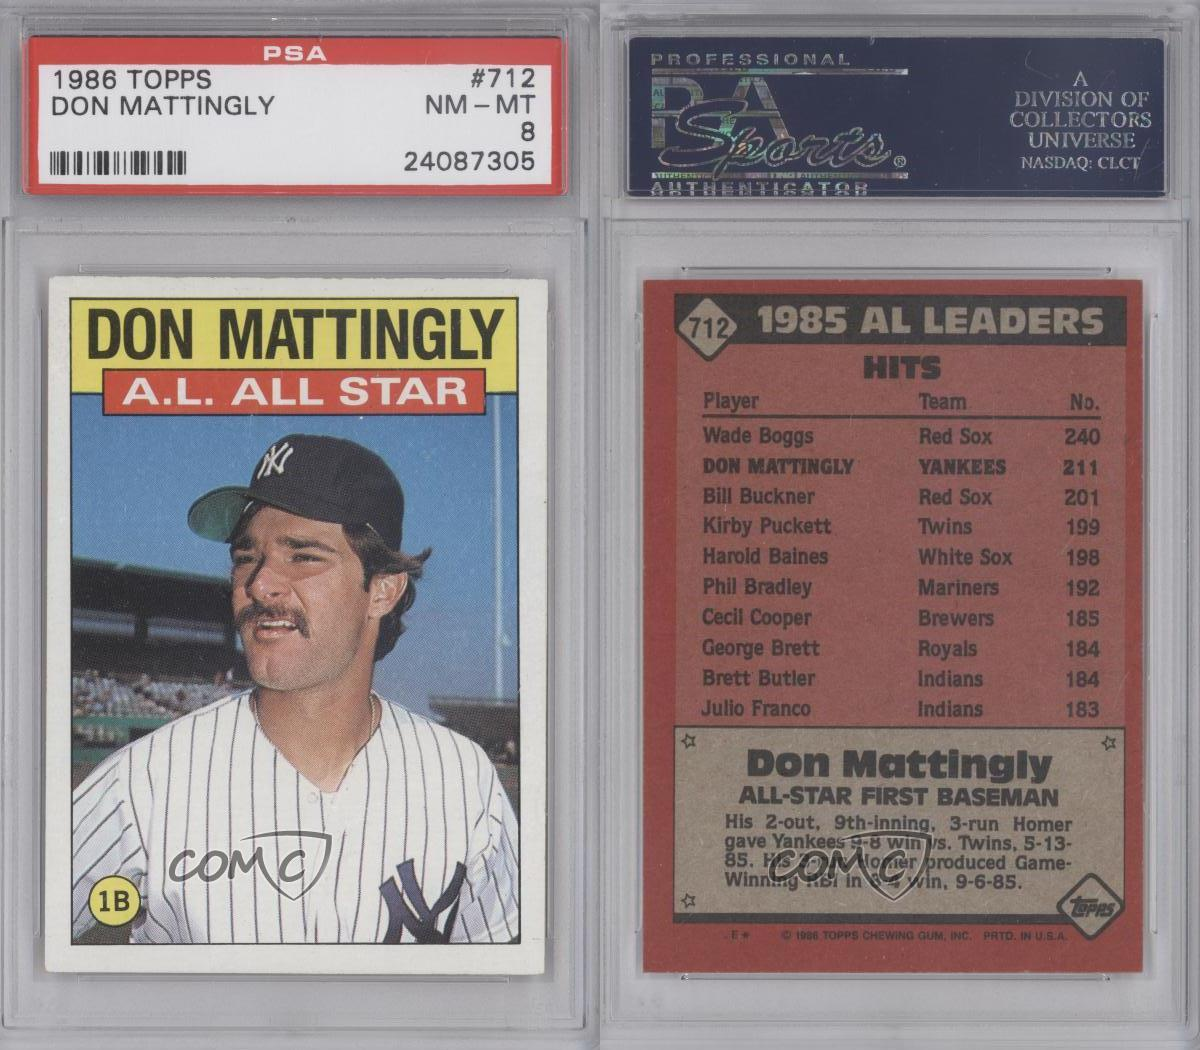 1986 Topps 712 Don Mattingly Psa 8 New York Yankees